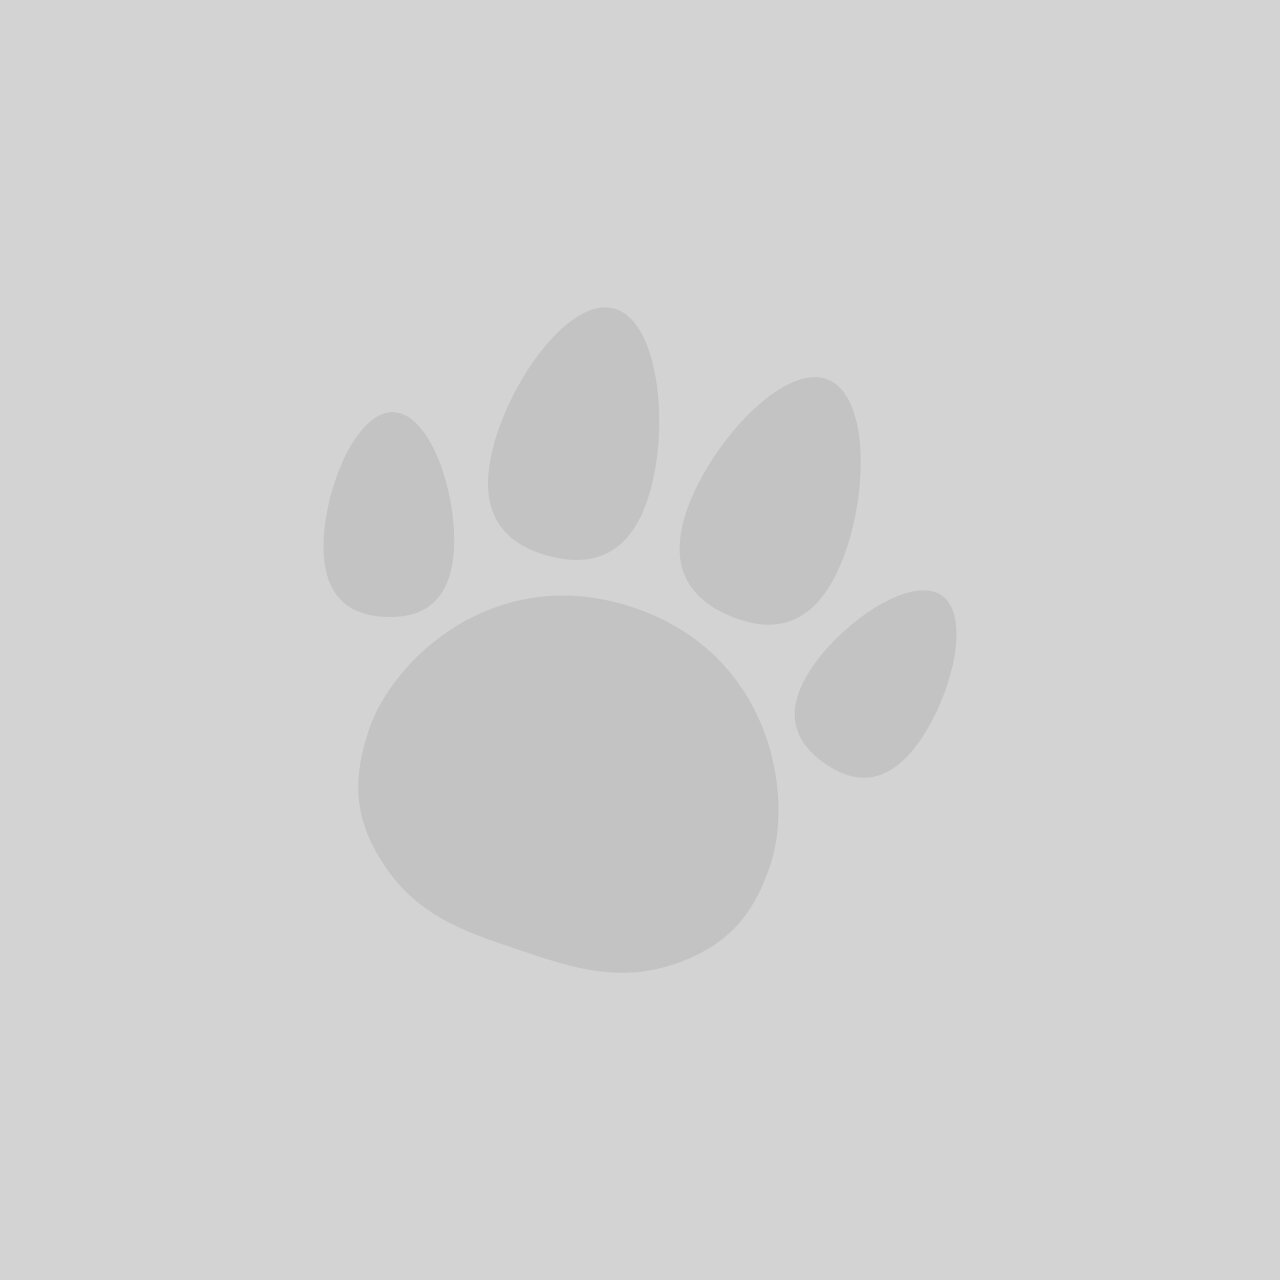 Danish Design Purple 2 in 1 Ultimate Dog Coat (11 Size Options)